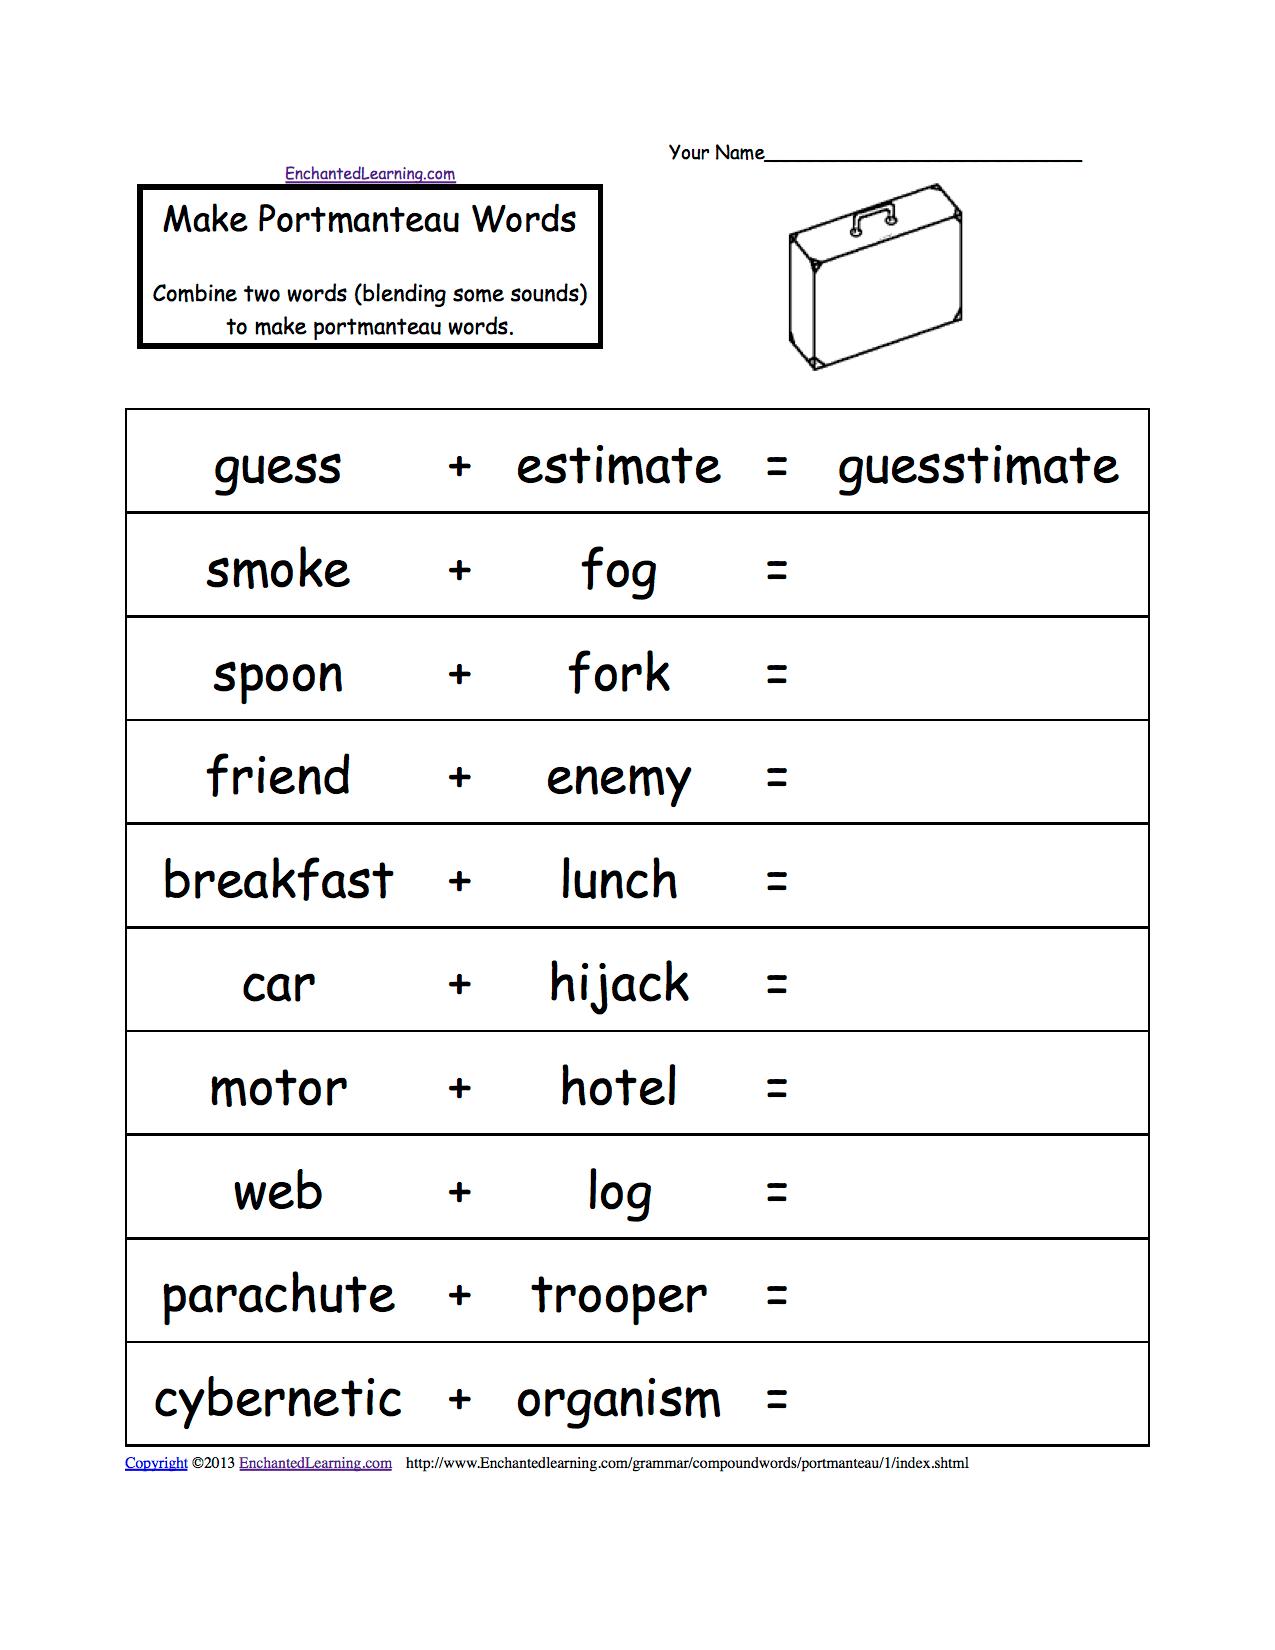 Portmanteau Words Printable Worksheets Enchantedlearning